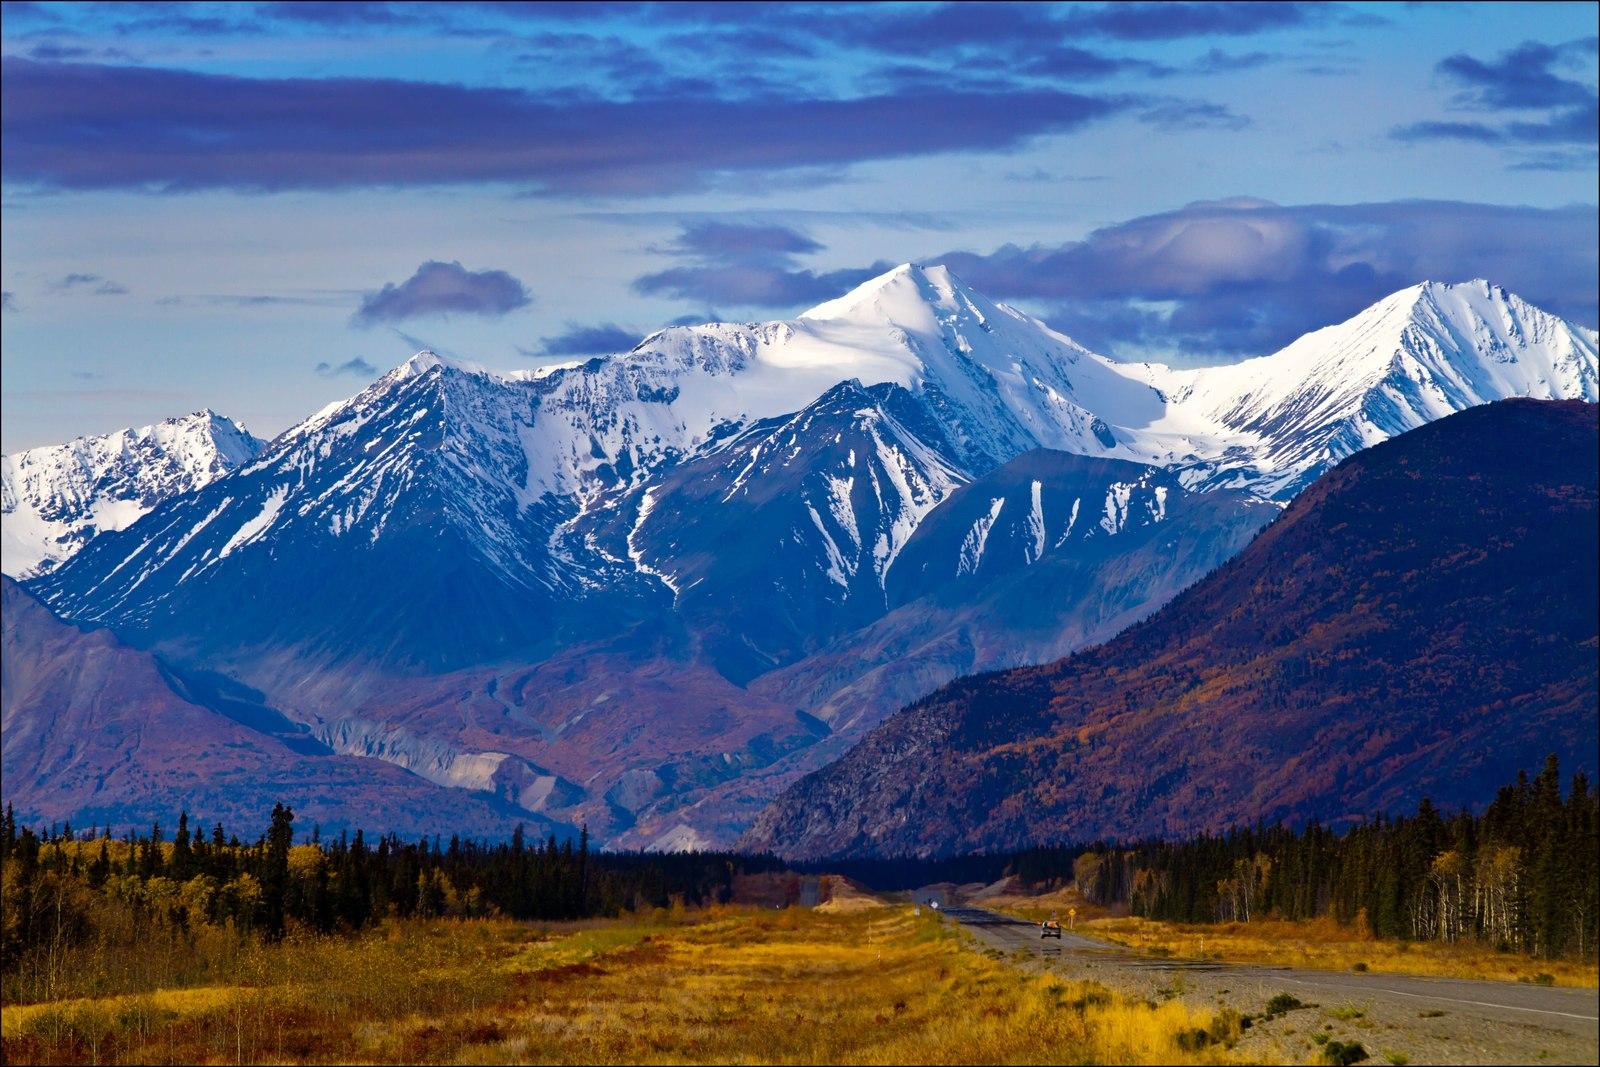 The Yukon - Alaska Quest